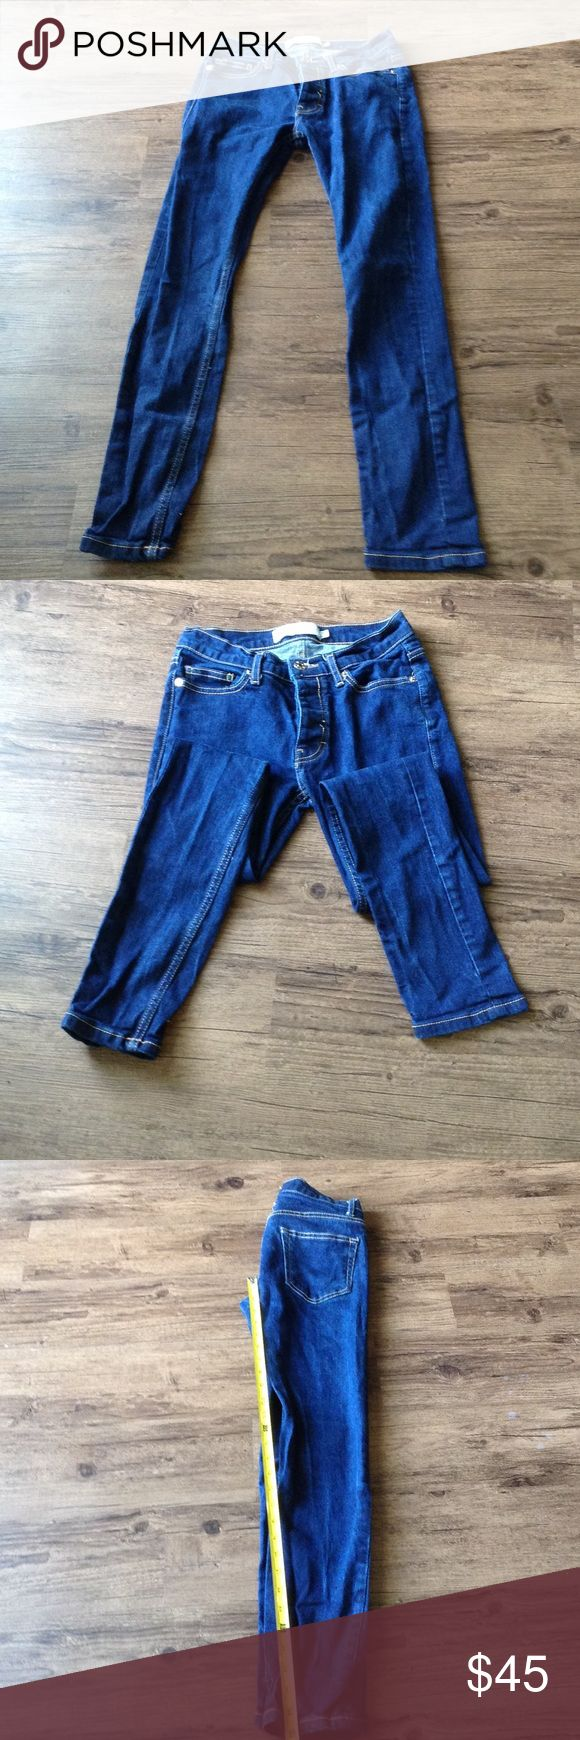 Top man Width 28 (3300J) Topman Jeans Skinny